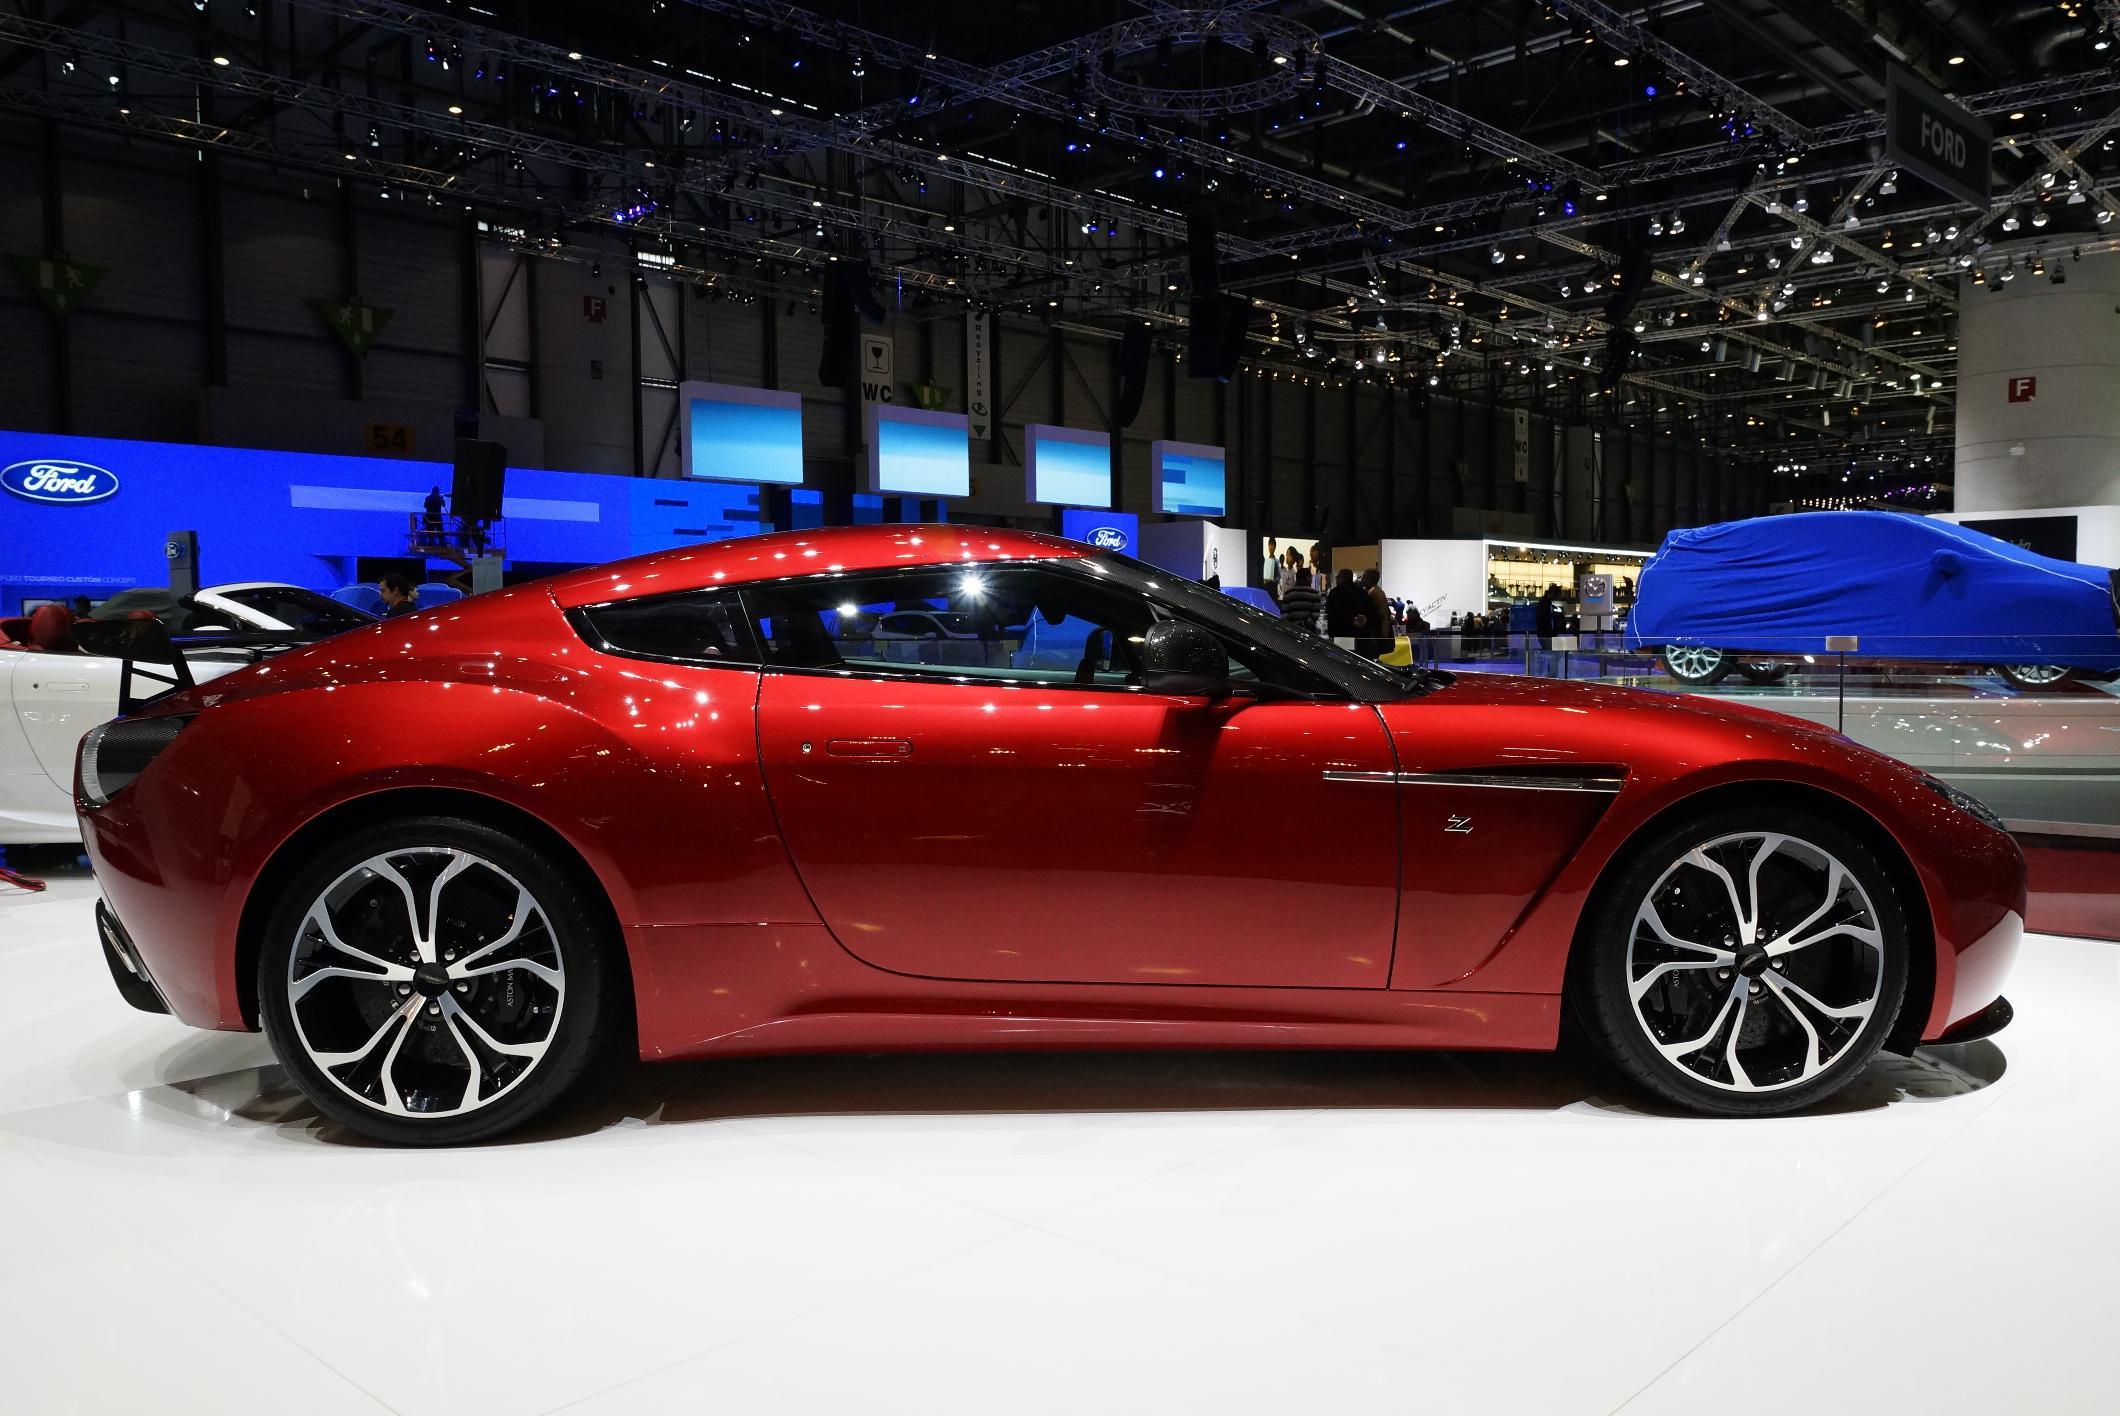 Aston Martin V12 Zagato Geneva 2012 Side